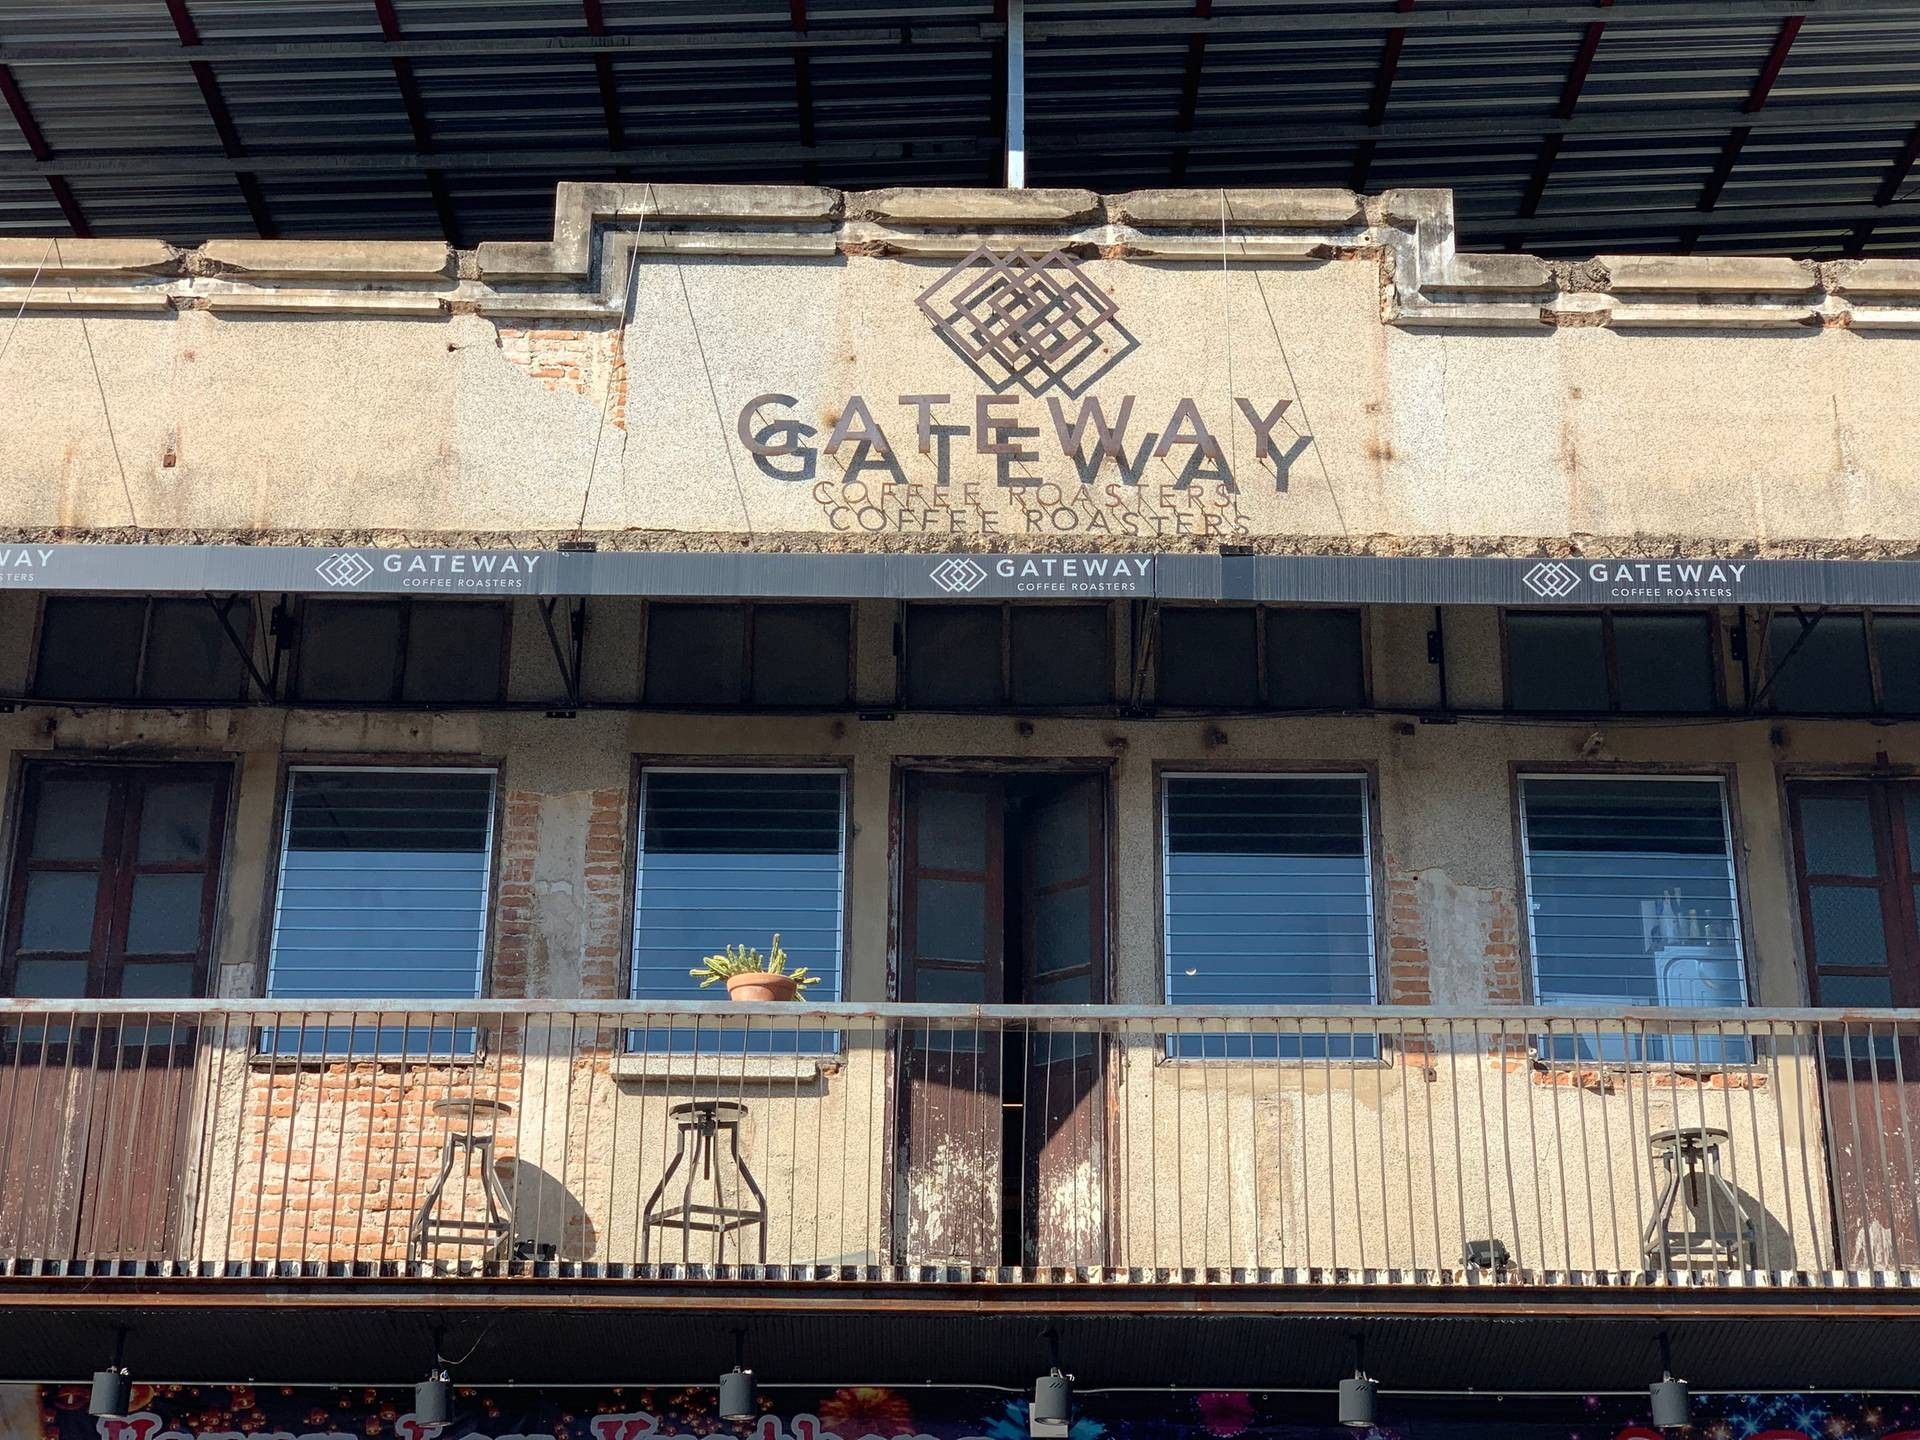 Gateway Coffee Roasters